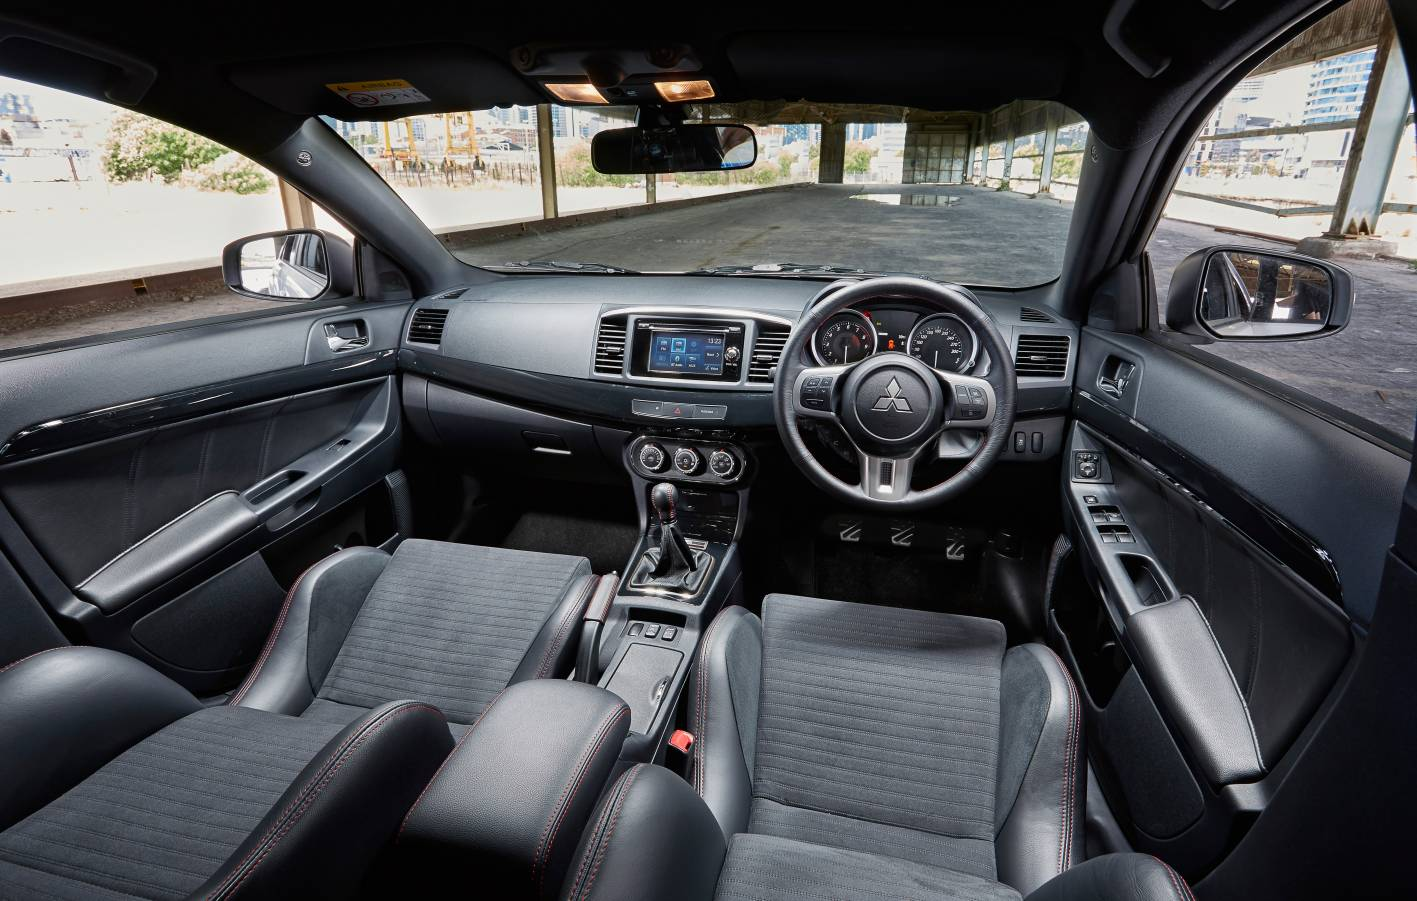 2015 Mitsubishi Lancer Evolution Final Edition On Sale Now 150 Only